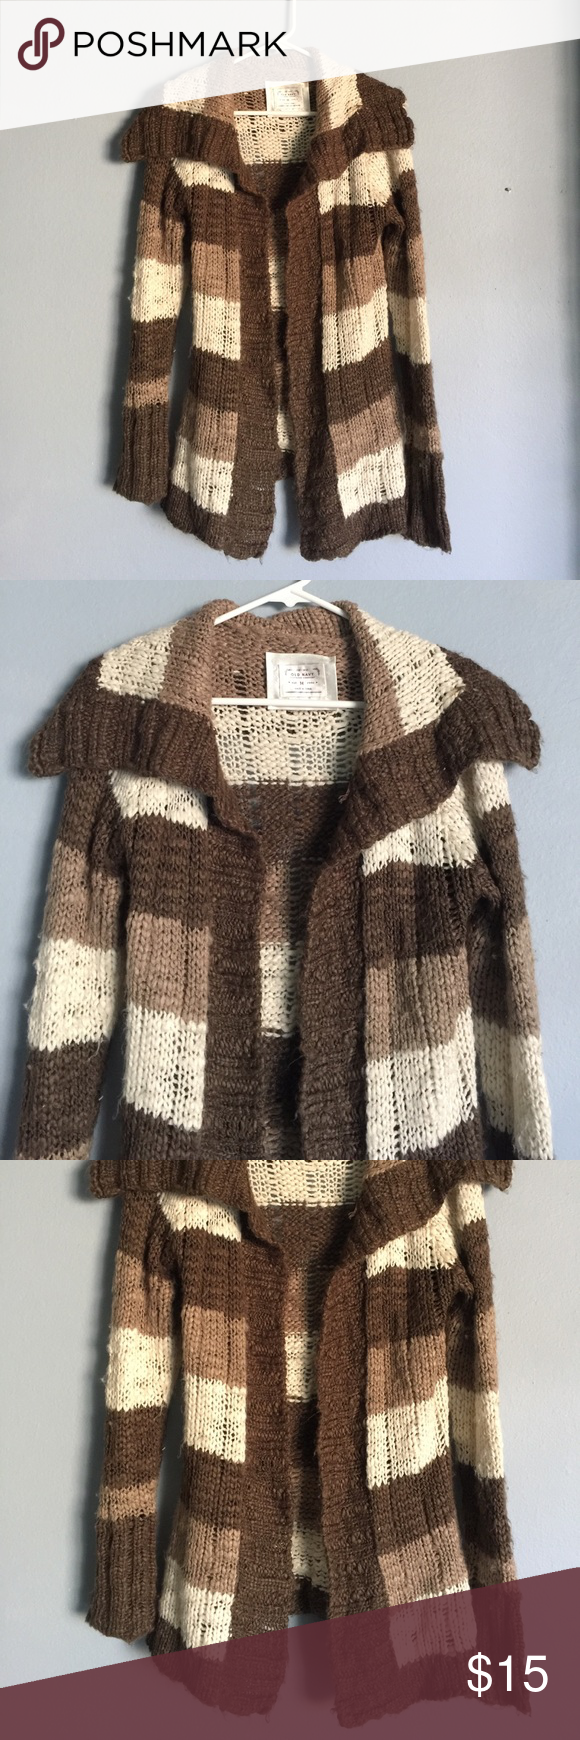 Super Cute Brown Fall Acrylic Sweater | Smoke free, Navy sweaters ...